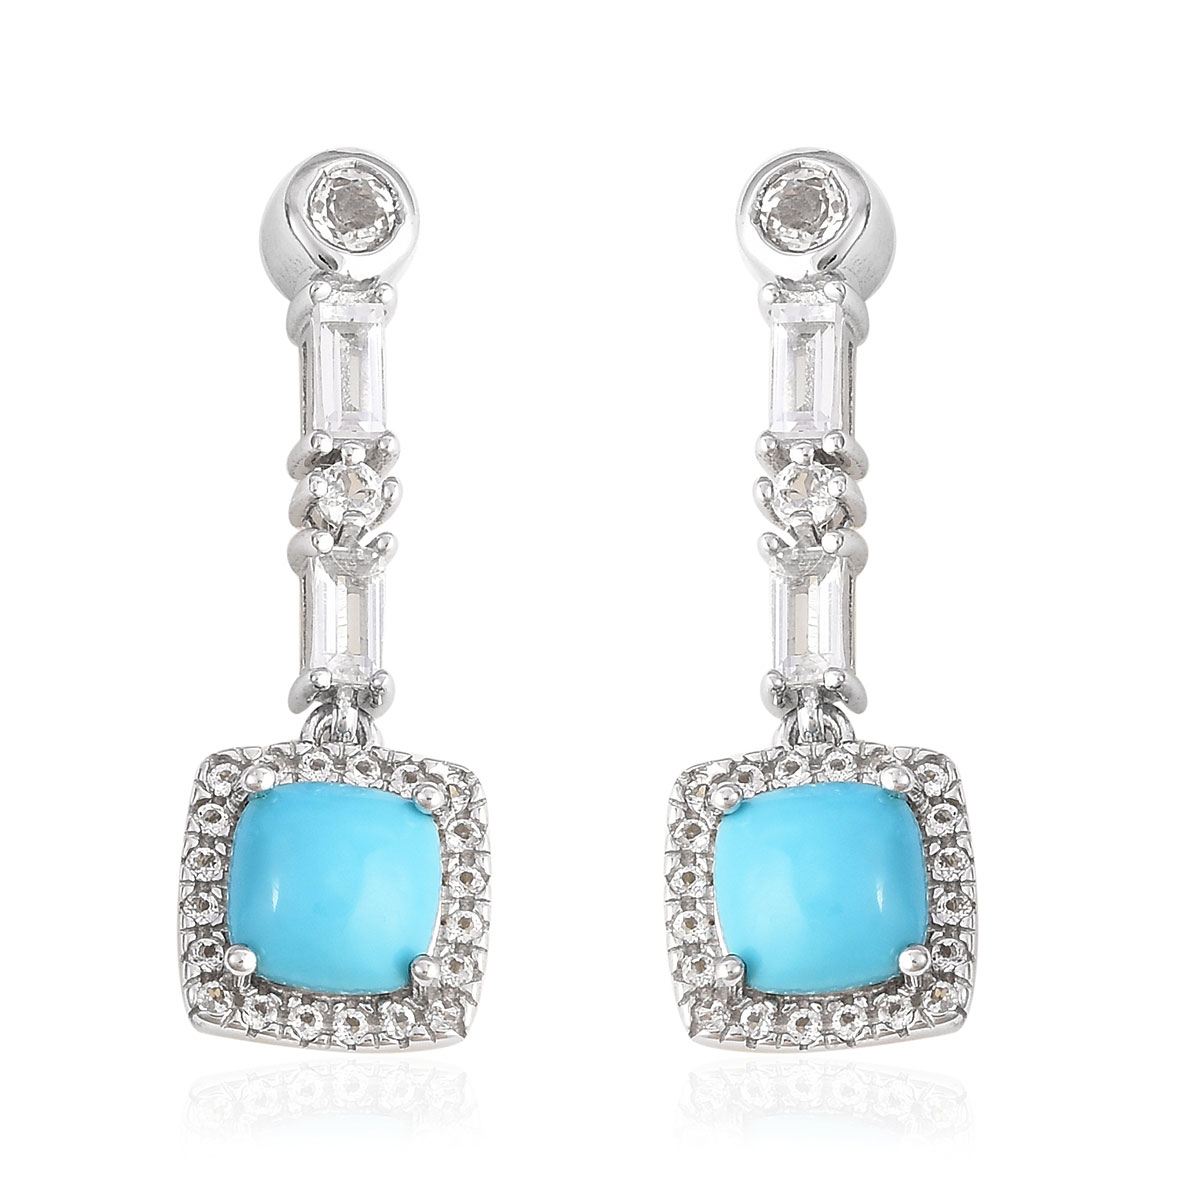 Arizona Sleeping Beauty Turquoise White Topaz Earrings In Sterling Silver 2 66 Ctw